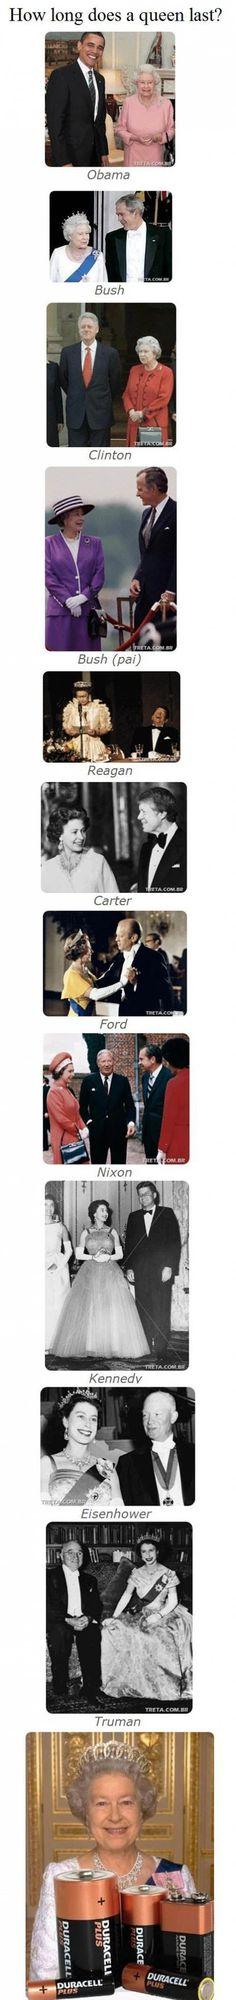 Amazin! 1 queen & 11 presidents & counting......